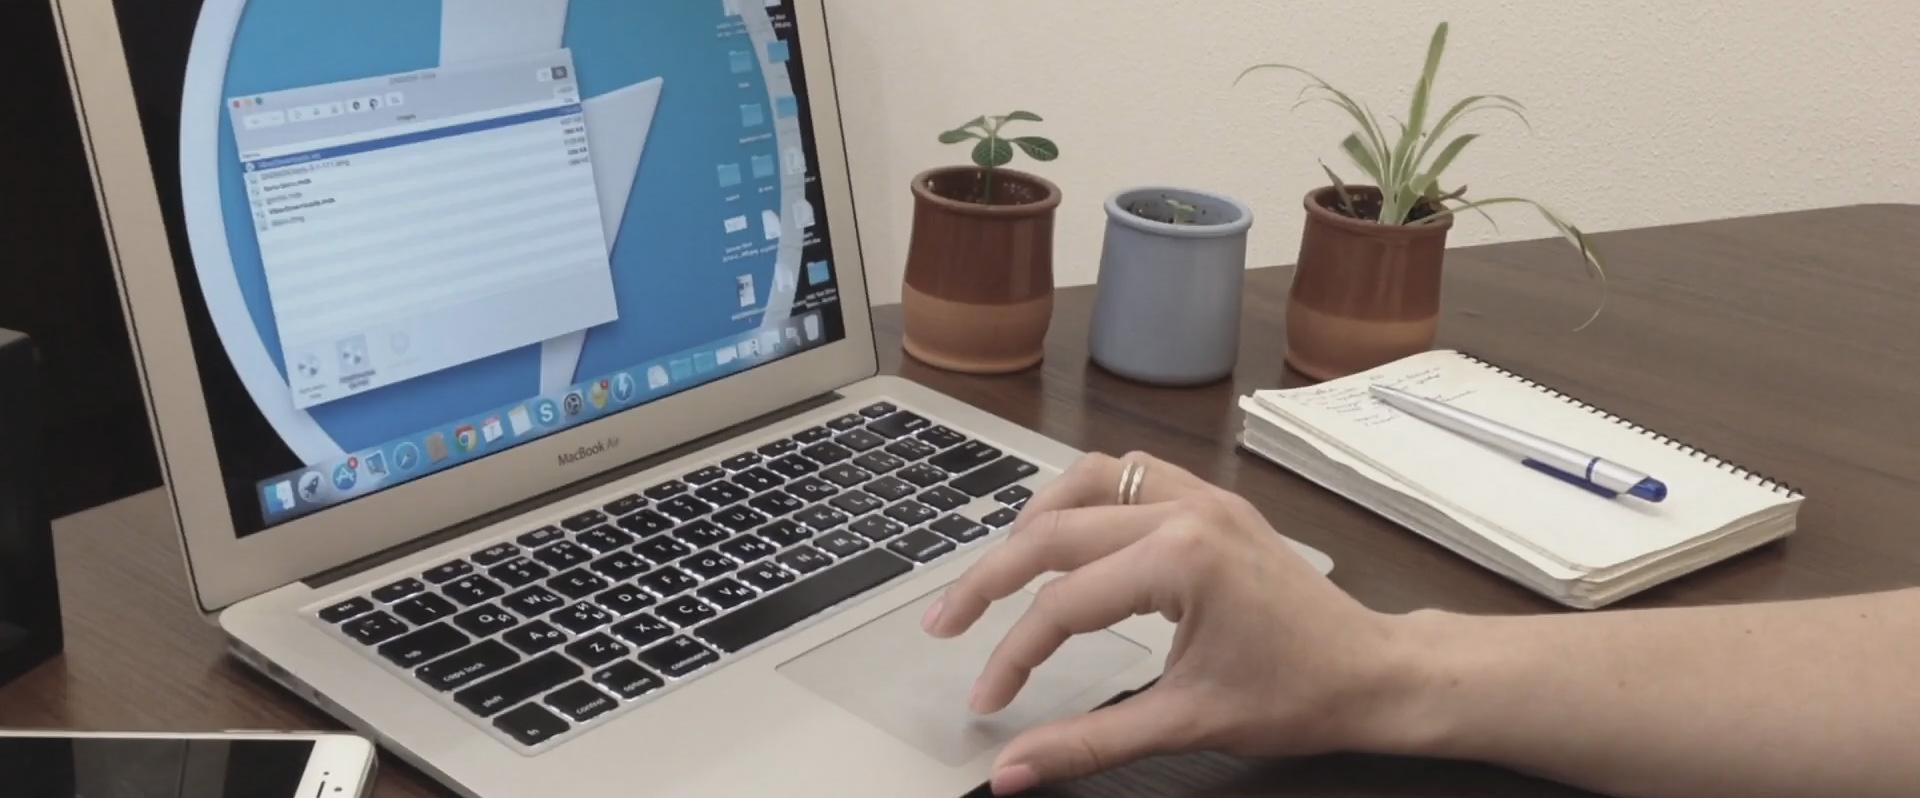 DAEMON Tools for Mac 6.1.346 破解版 - 超经典虚拟光驱软件